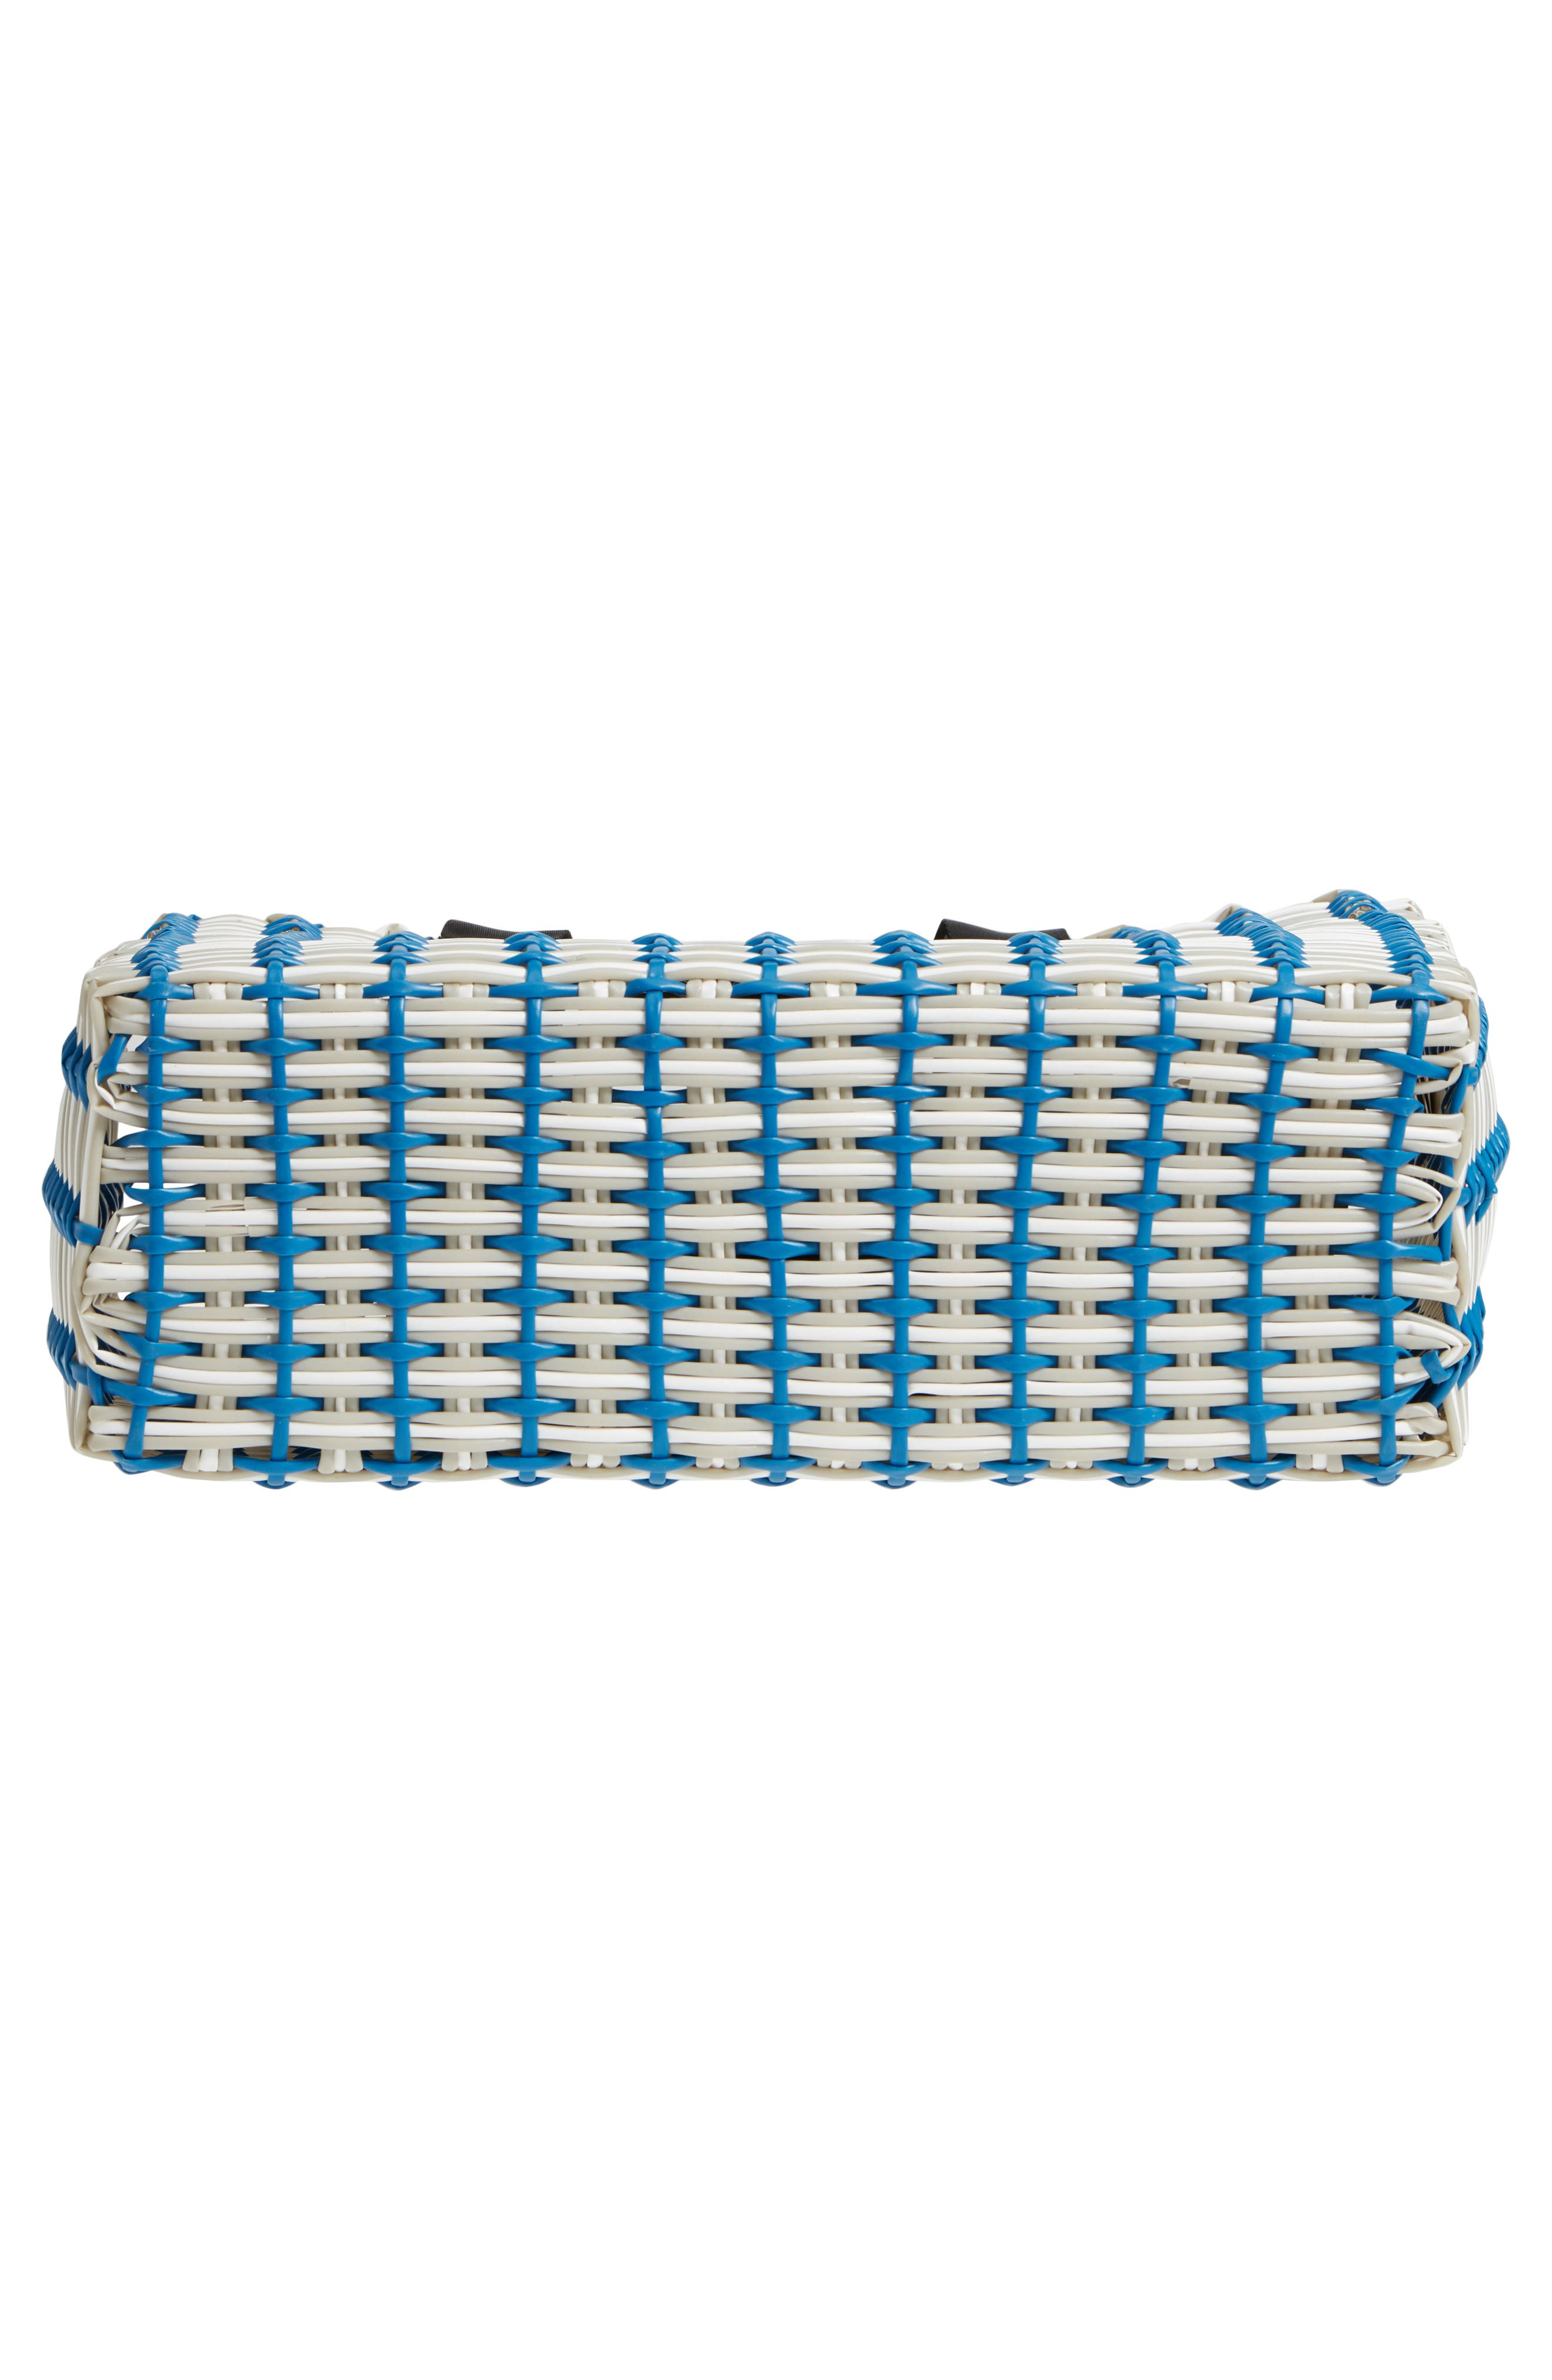 Stripe Woven Tote,                             Alternate thumbnail 6, color,                             Navy Blue